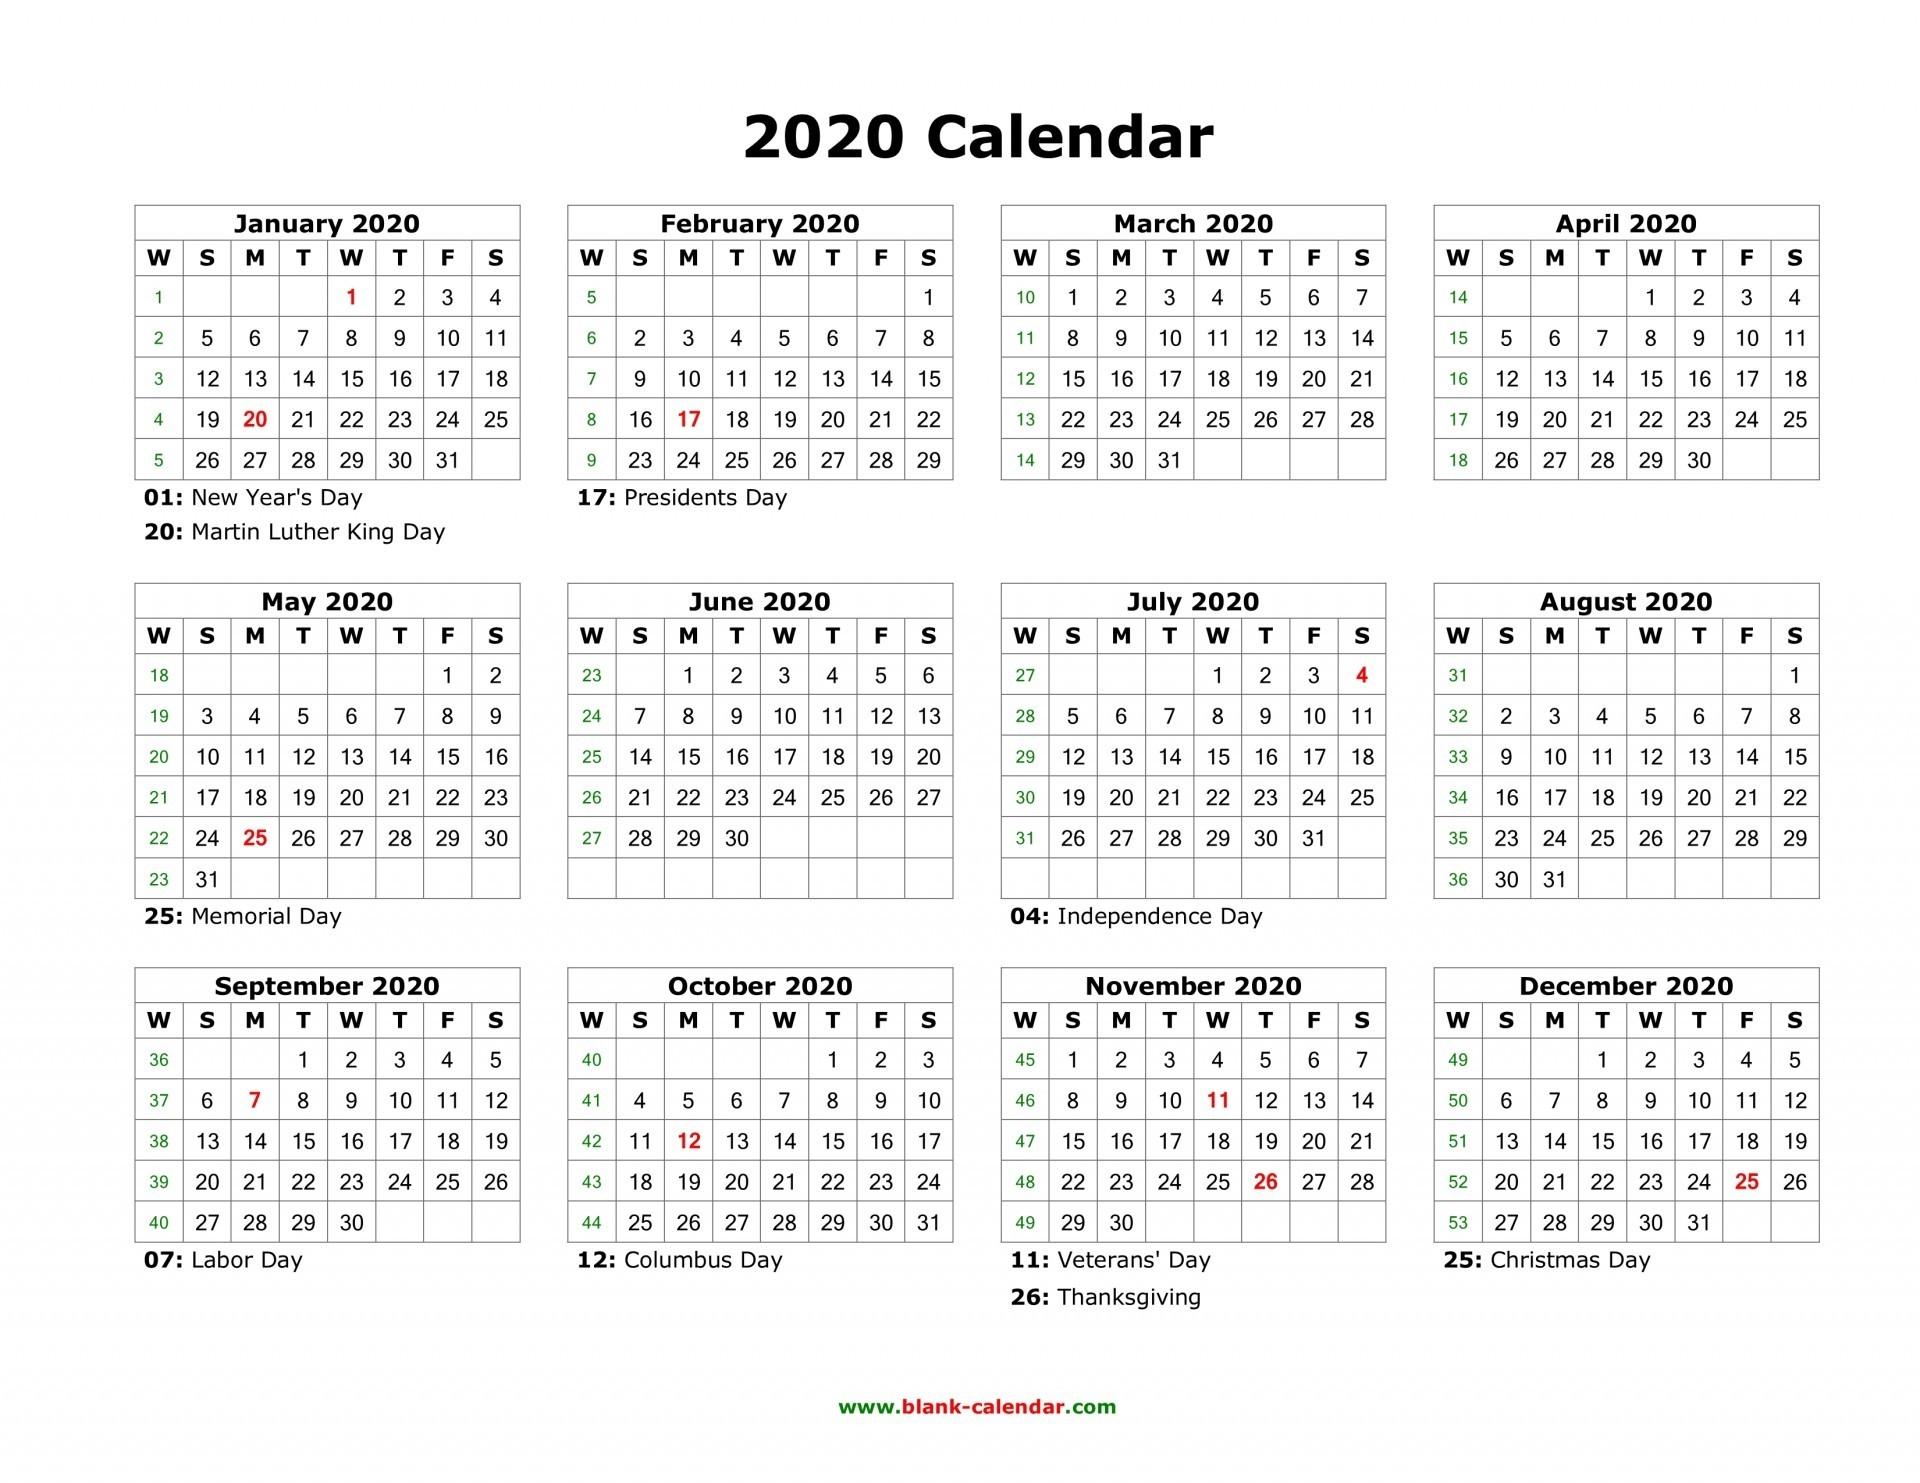 Free Printable 2020 Calendar With Holidays South Africa-2020 South Africa Calendar And Holidays